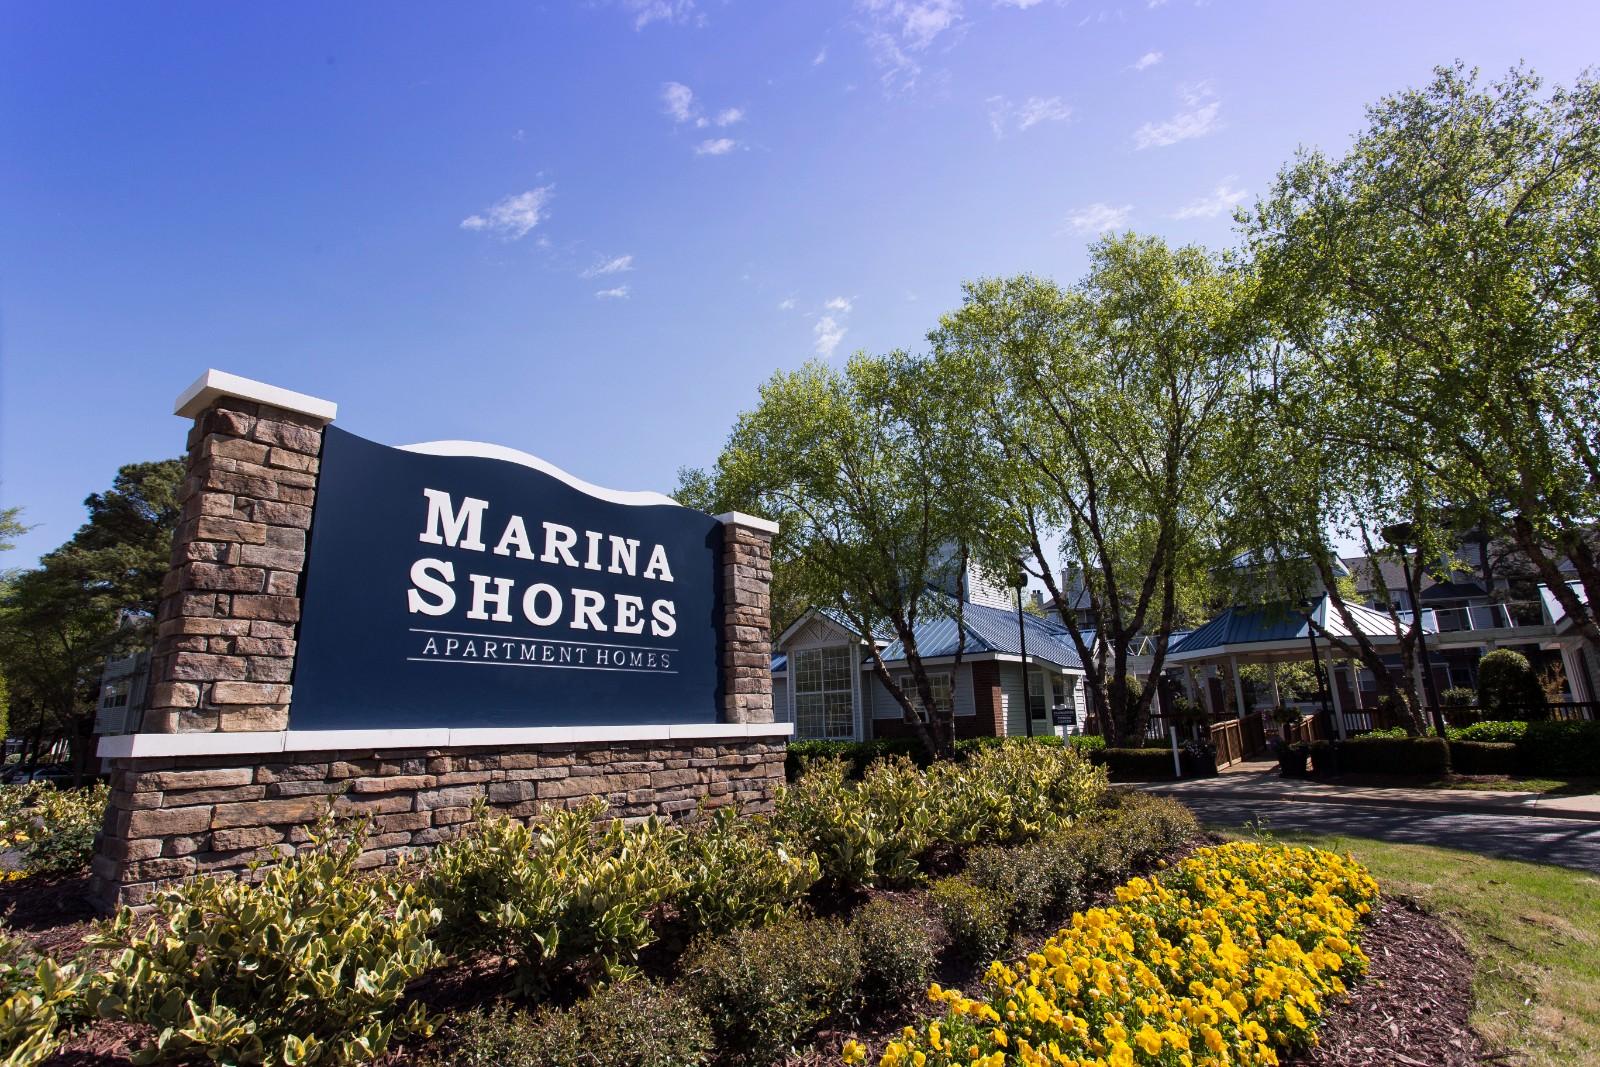 Beautiful Landscaping and Park-like Setting at Marina Shores Apartment Homes, 2257 Willow Oak Circle, Virginia Beach